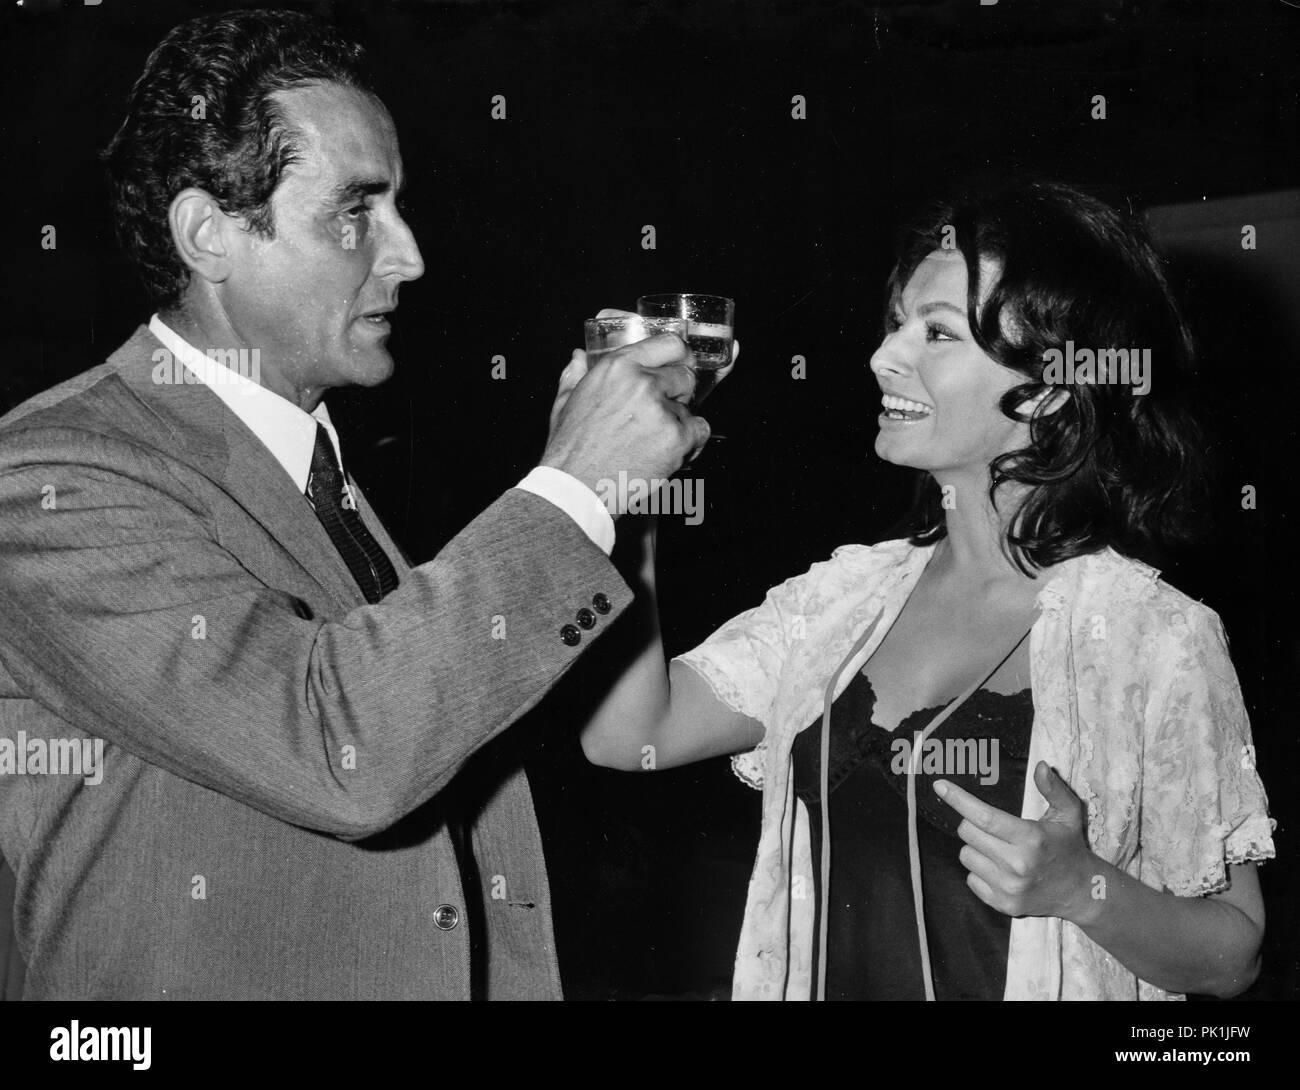 Vittorio Gassman Sophia Loren 60s Stock Photo Alamy